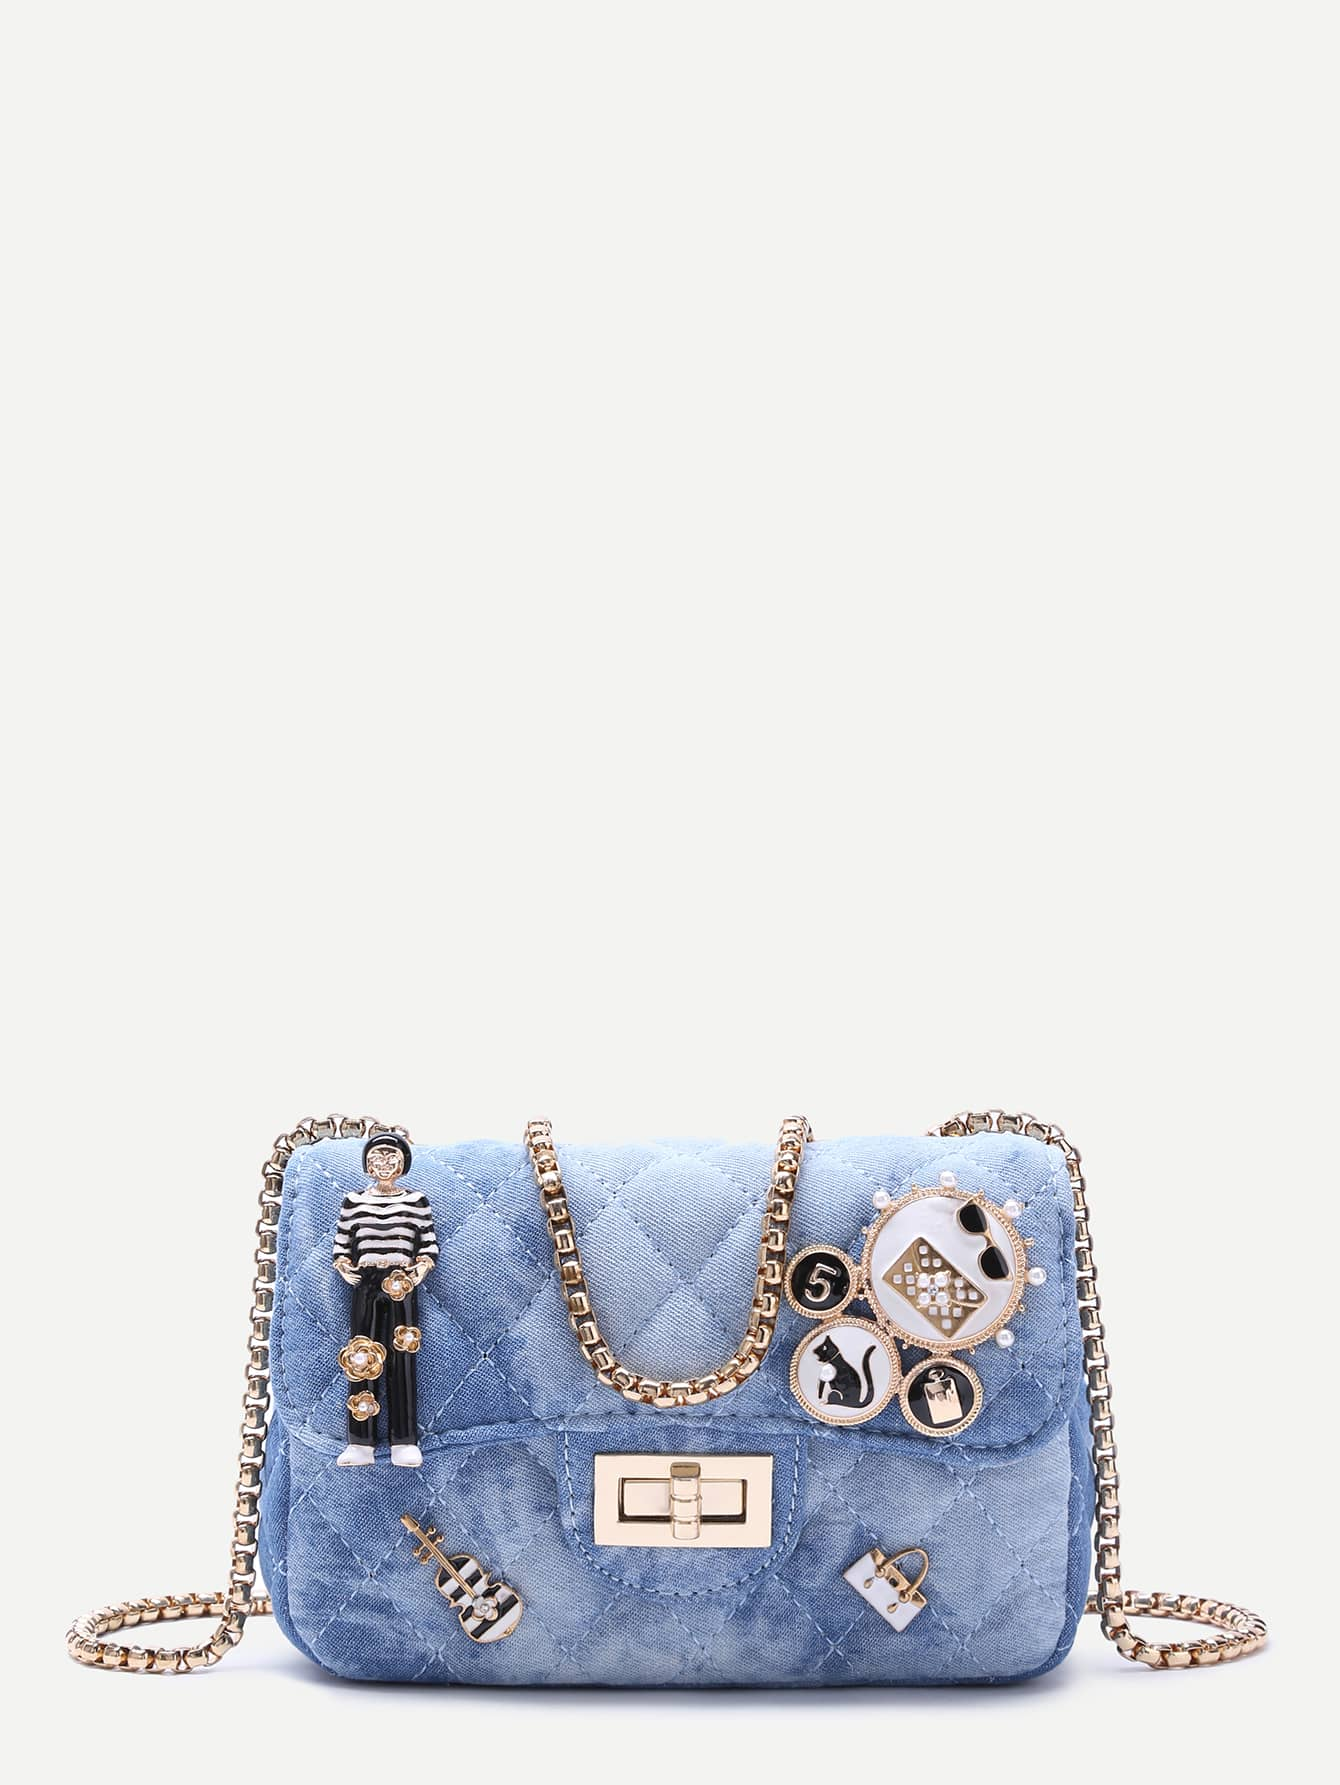 Blue Denim Metallic Embellished Mini Quilted Chain BagBlue Denim Metallic Embellished Mini Quilted Chain Bag<br><br>color: Blue<br>size: None